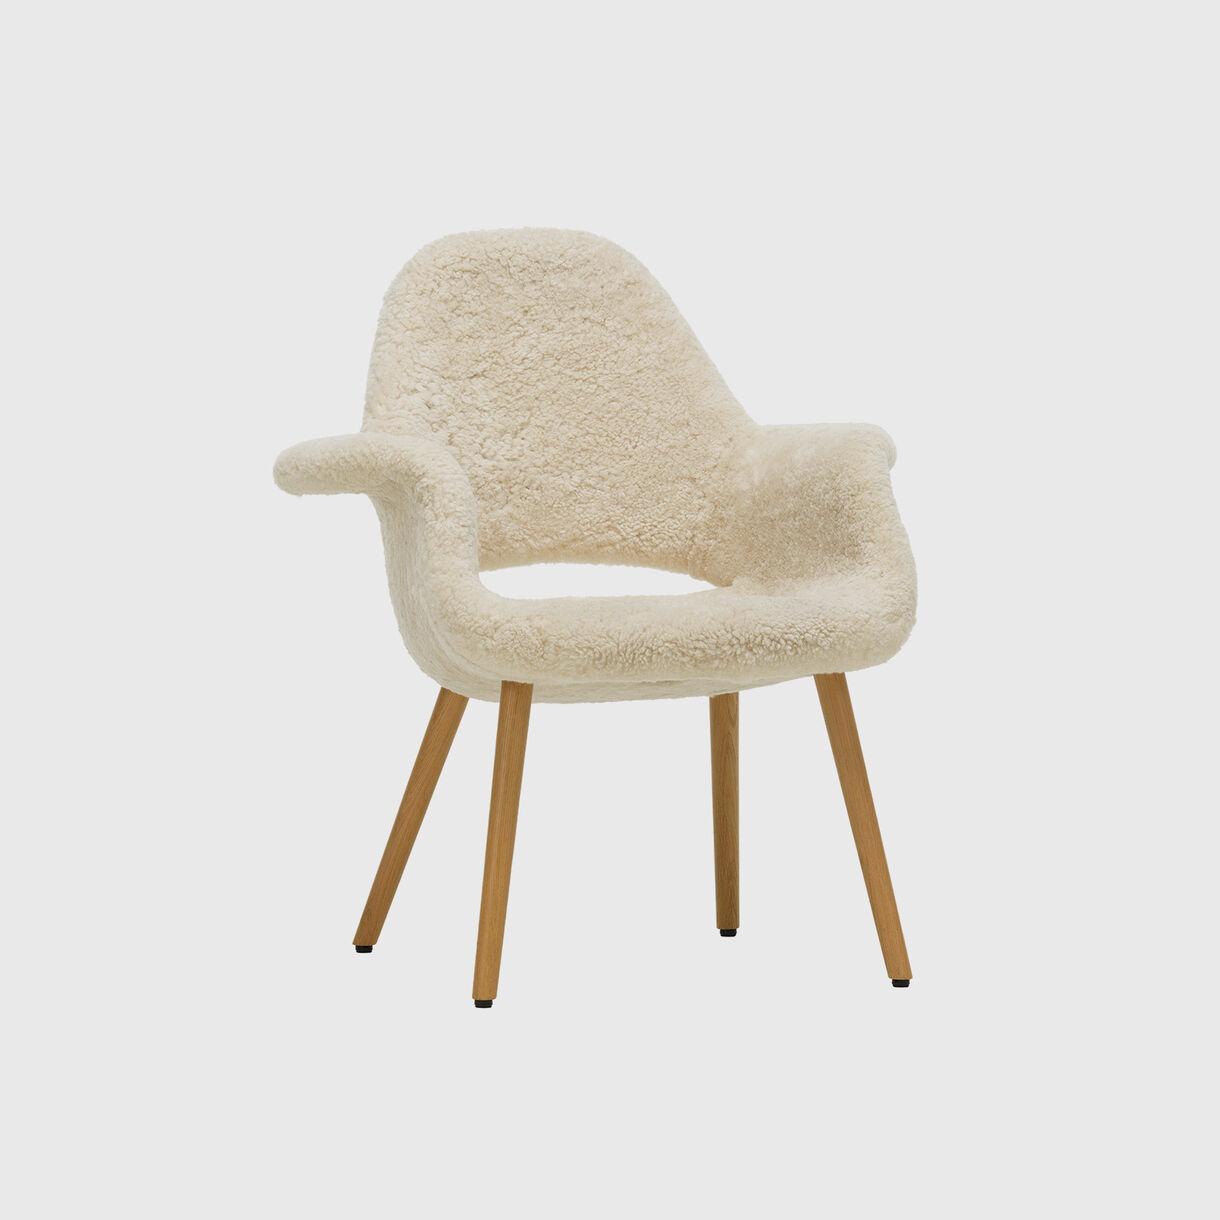 Organic Chair, Sheepskin